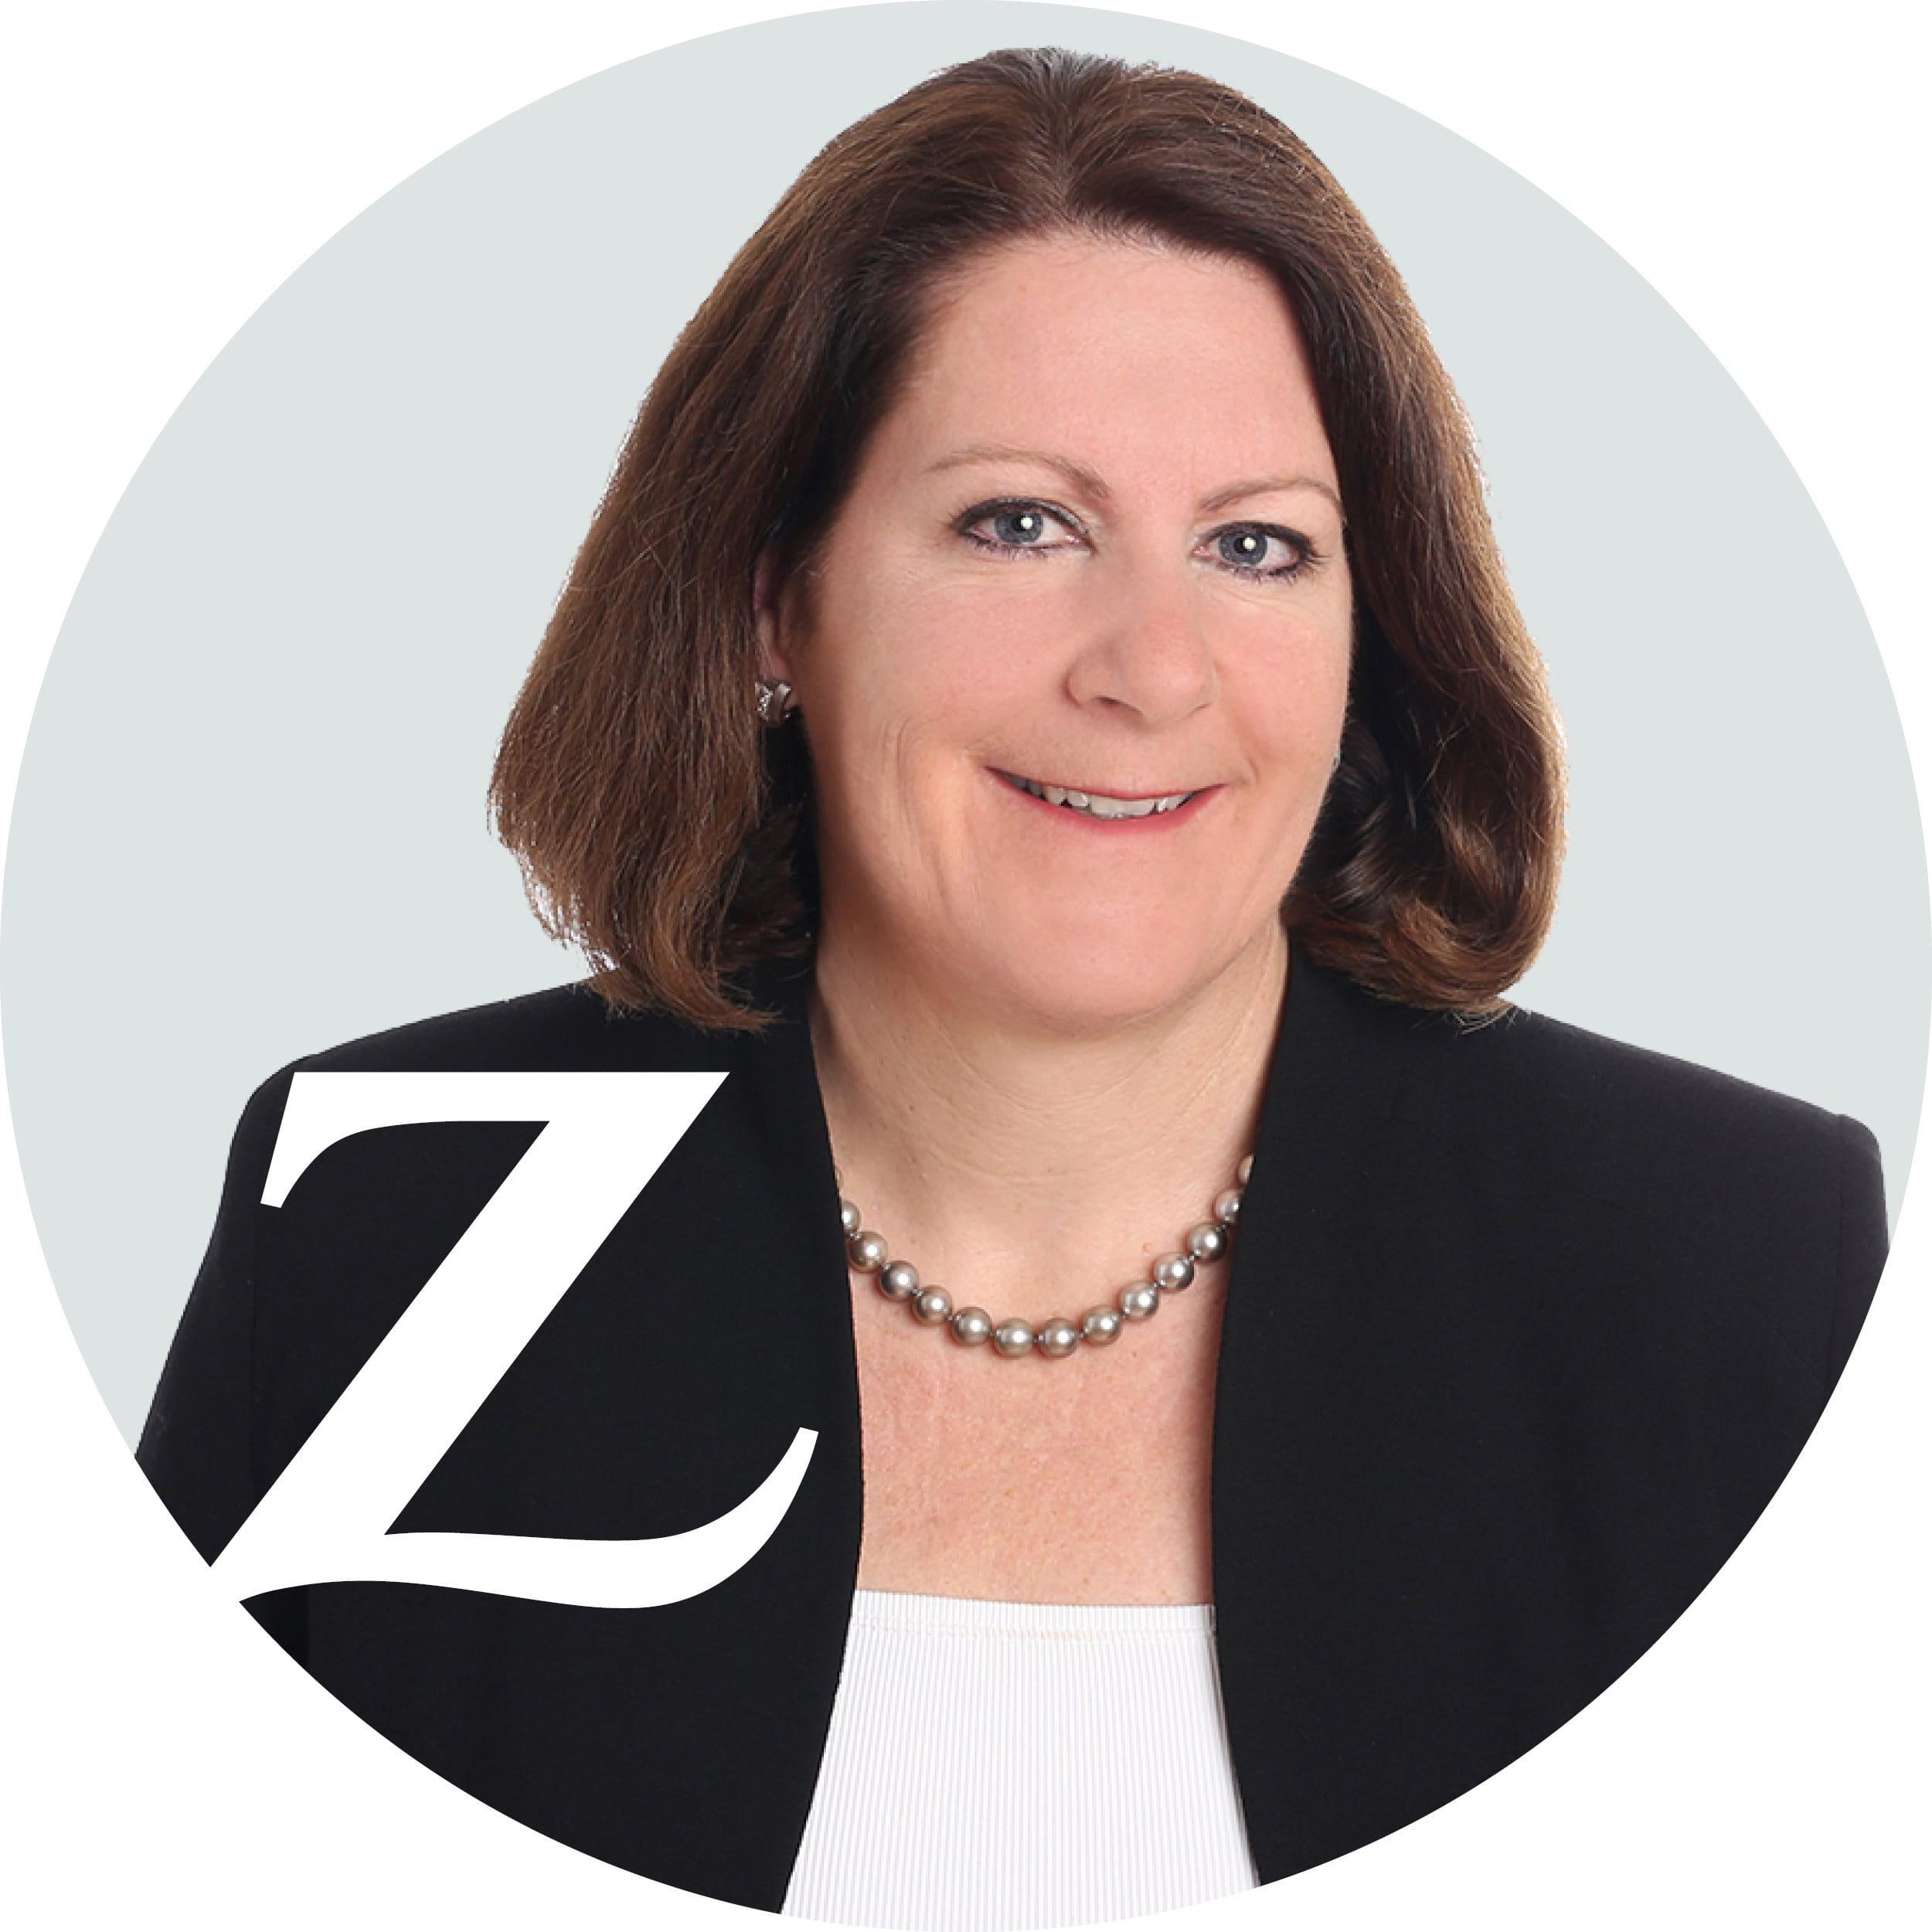 Sandra Hauser, Head Technology, Data and Business Transformation